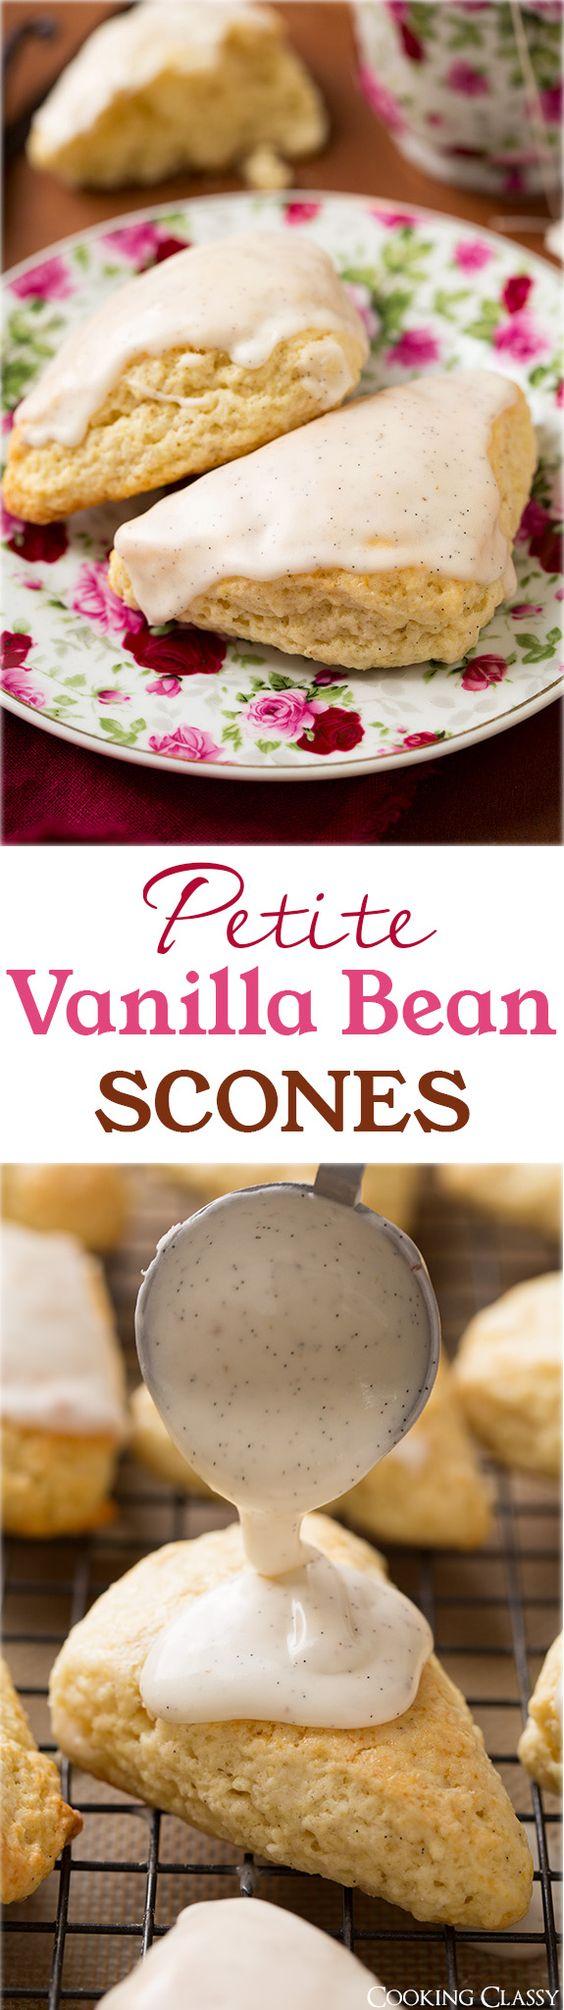 Petite Vanilla Bean Scones with Vanilla Bean Glaze (better than ...